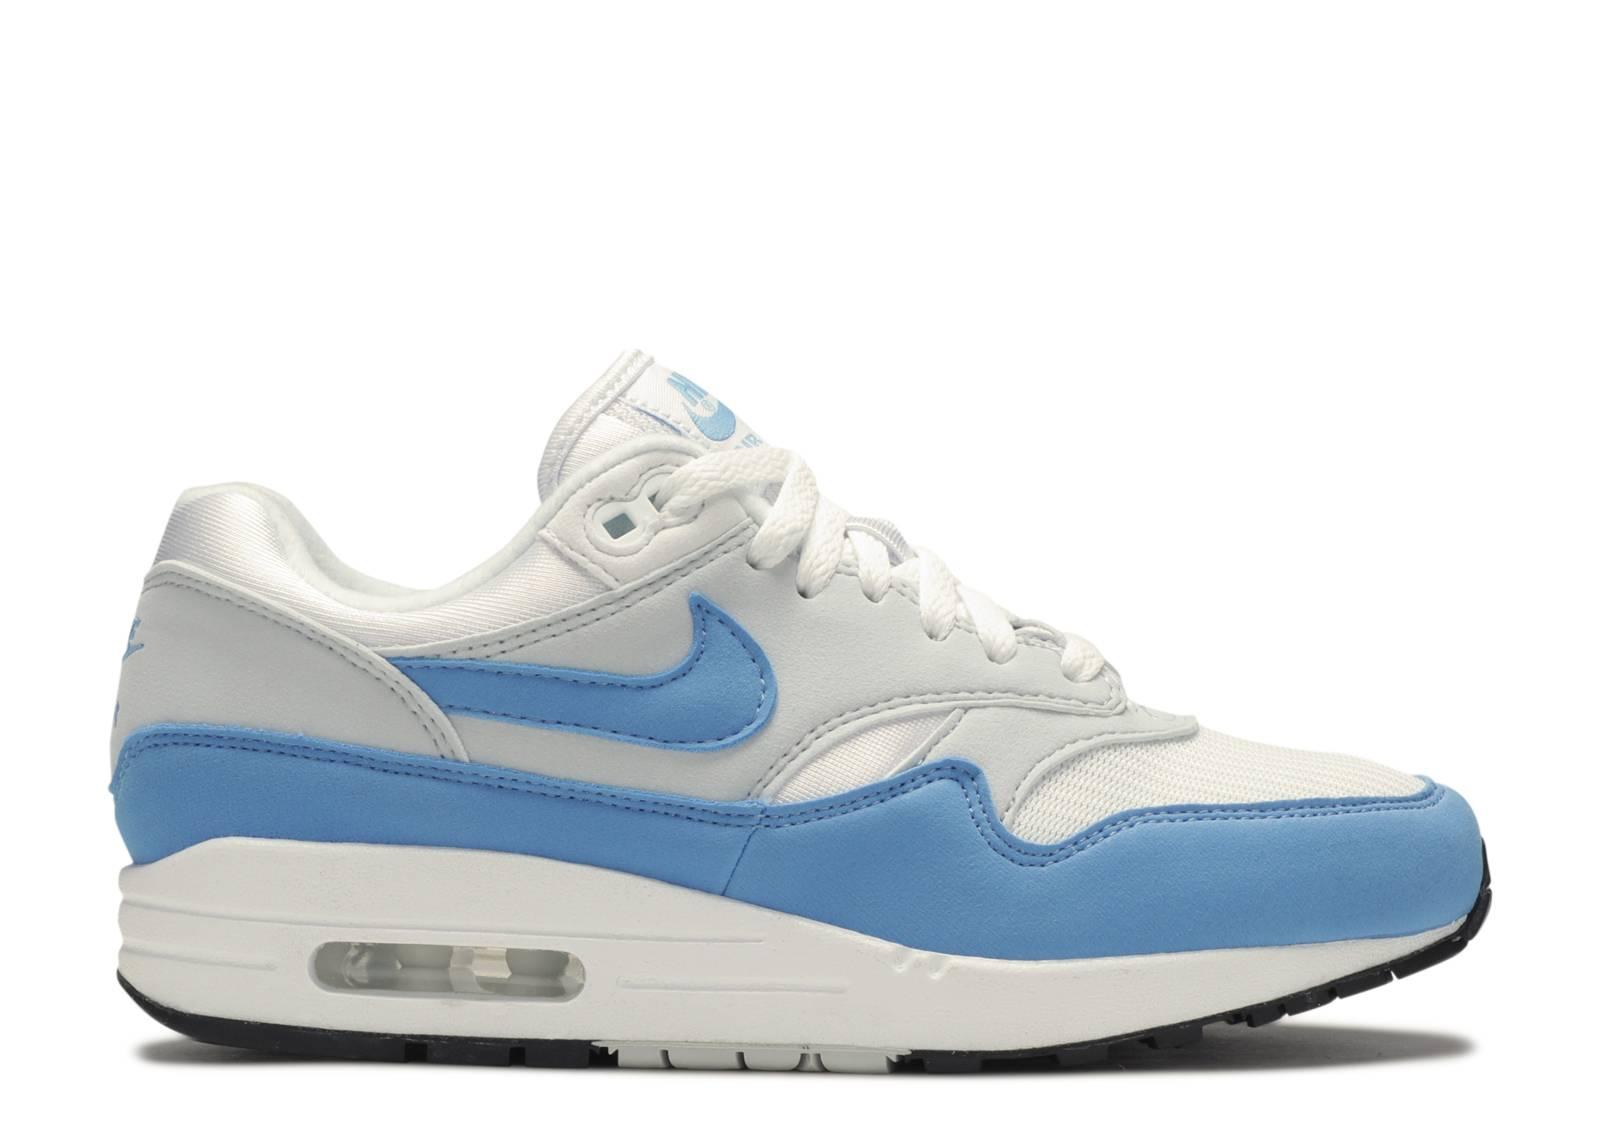 Nike Sportswear WMNS Air Max 1 Essential University Blue